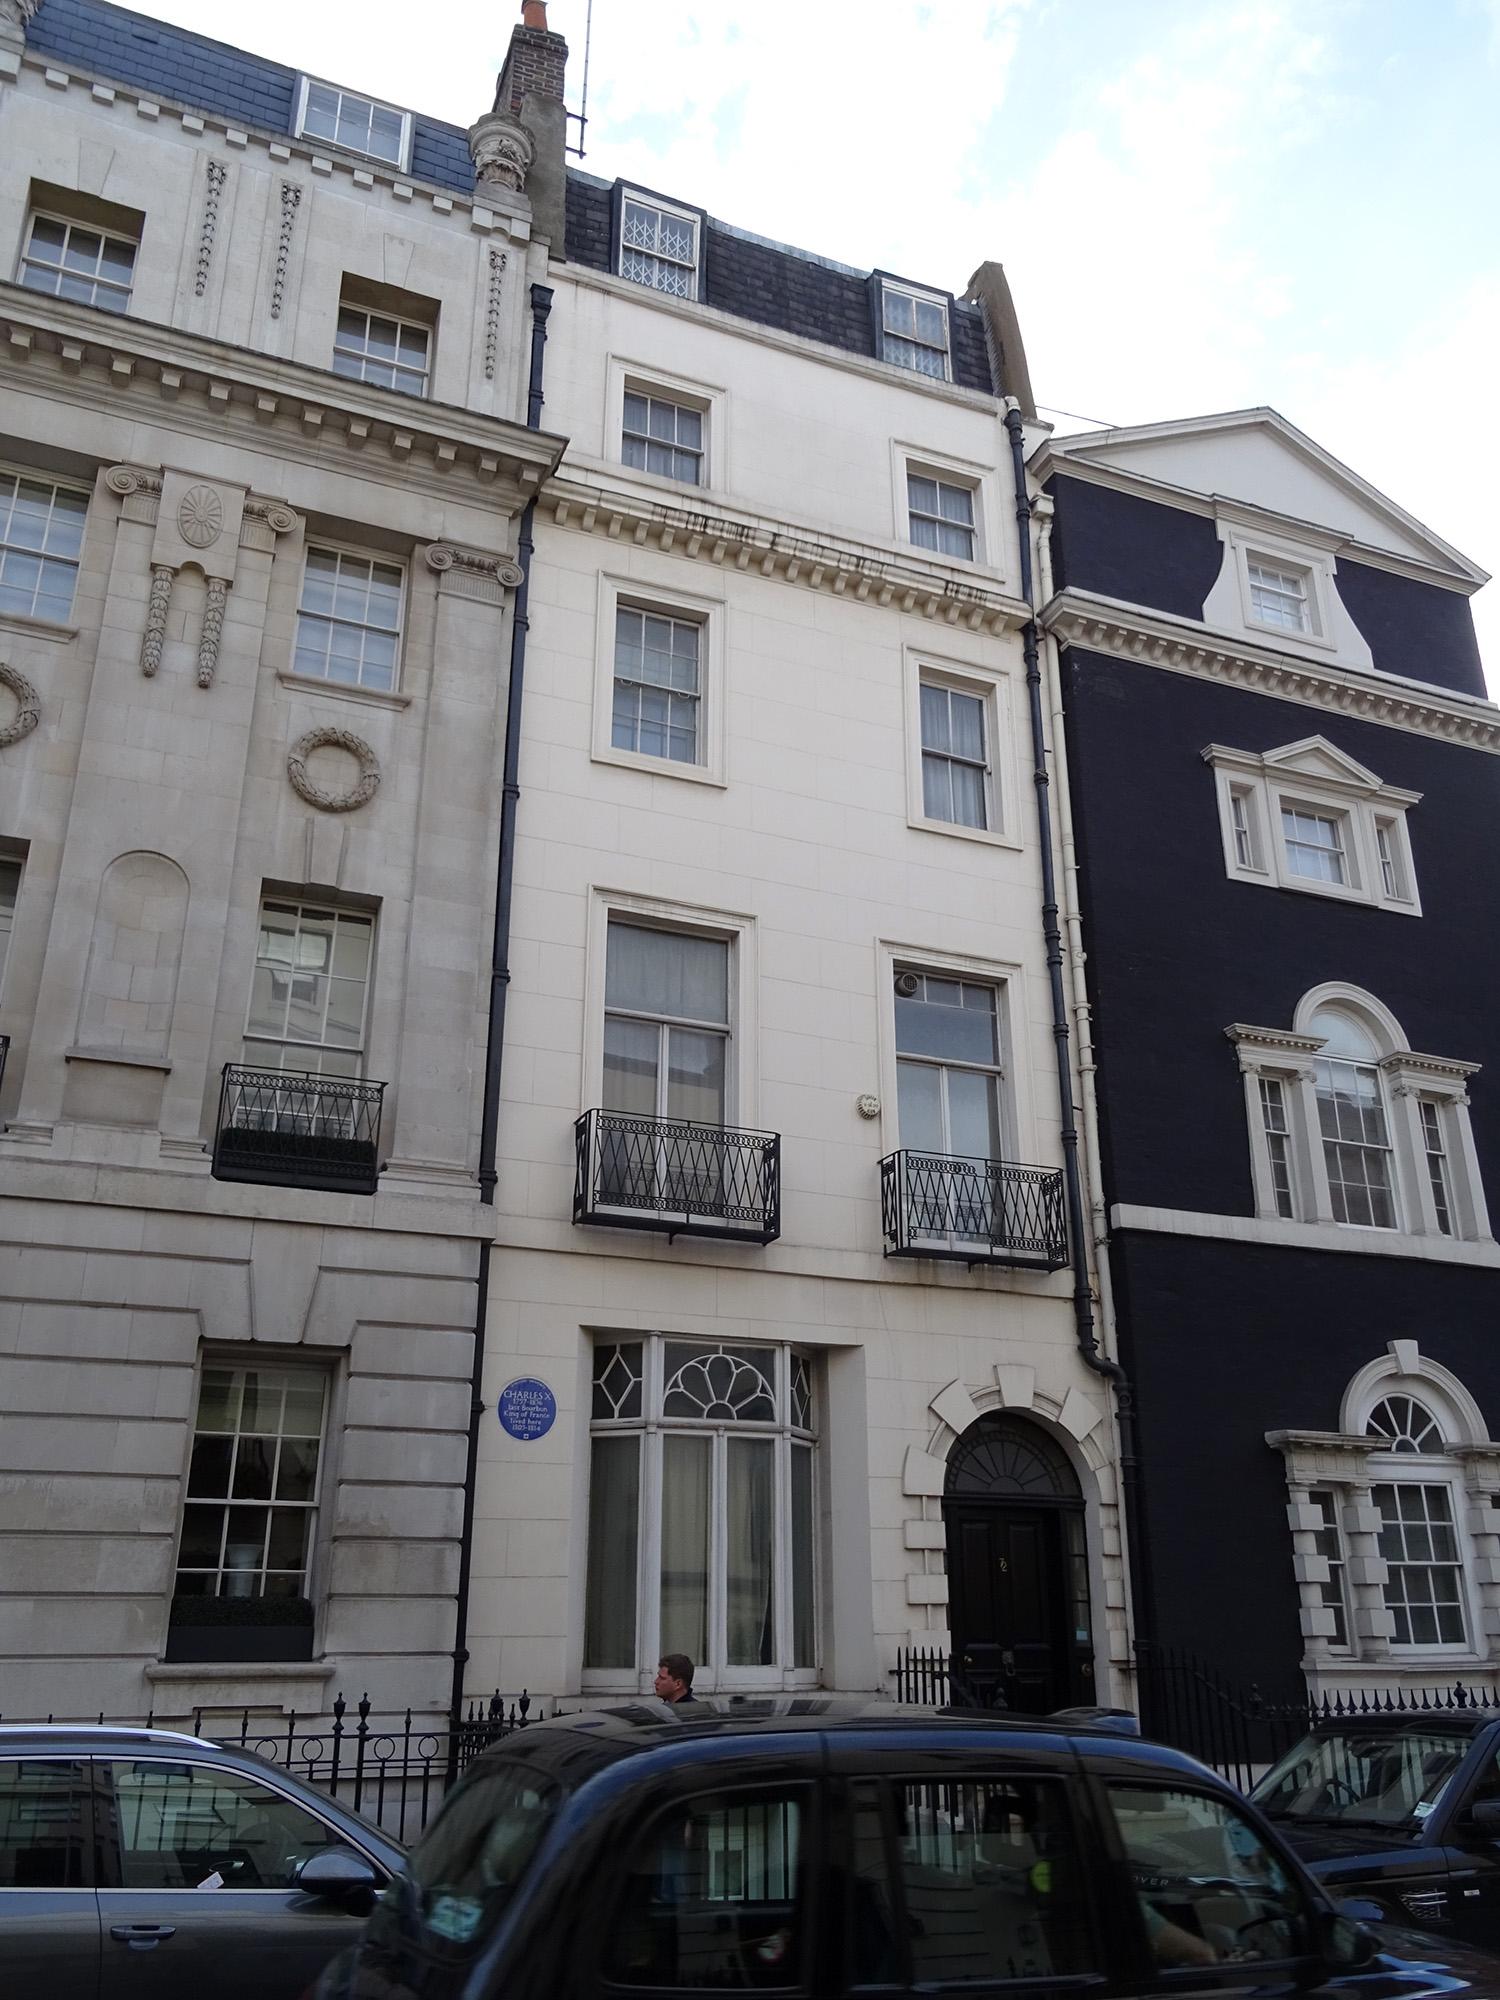 File:Charles X - 72 South Audley Street Mayfair London W1K 1JB.jpg -  Wikimedia Commons